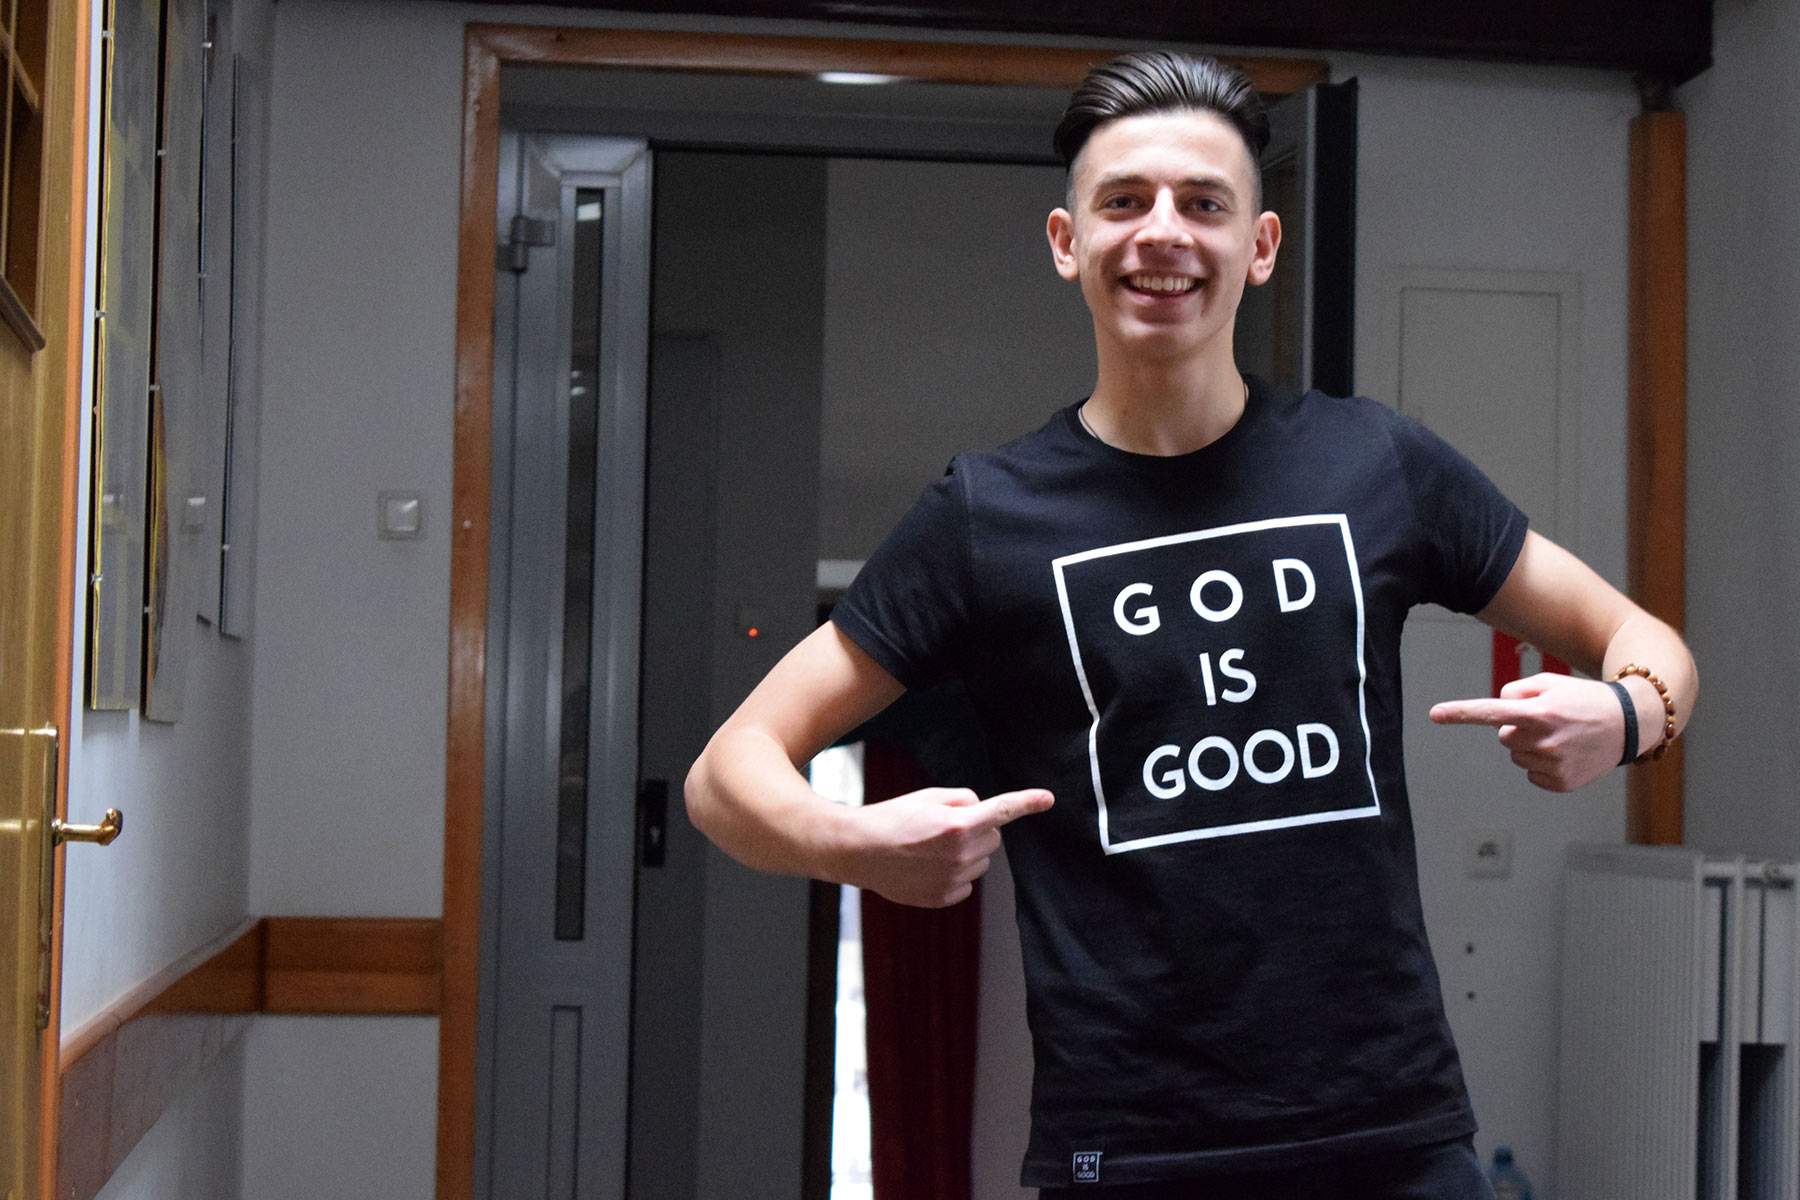 koszulki fanow chrześcijańskie koszulki